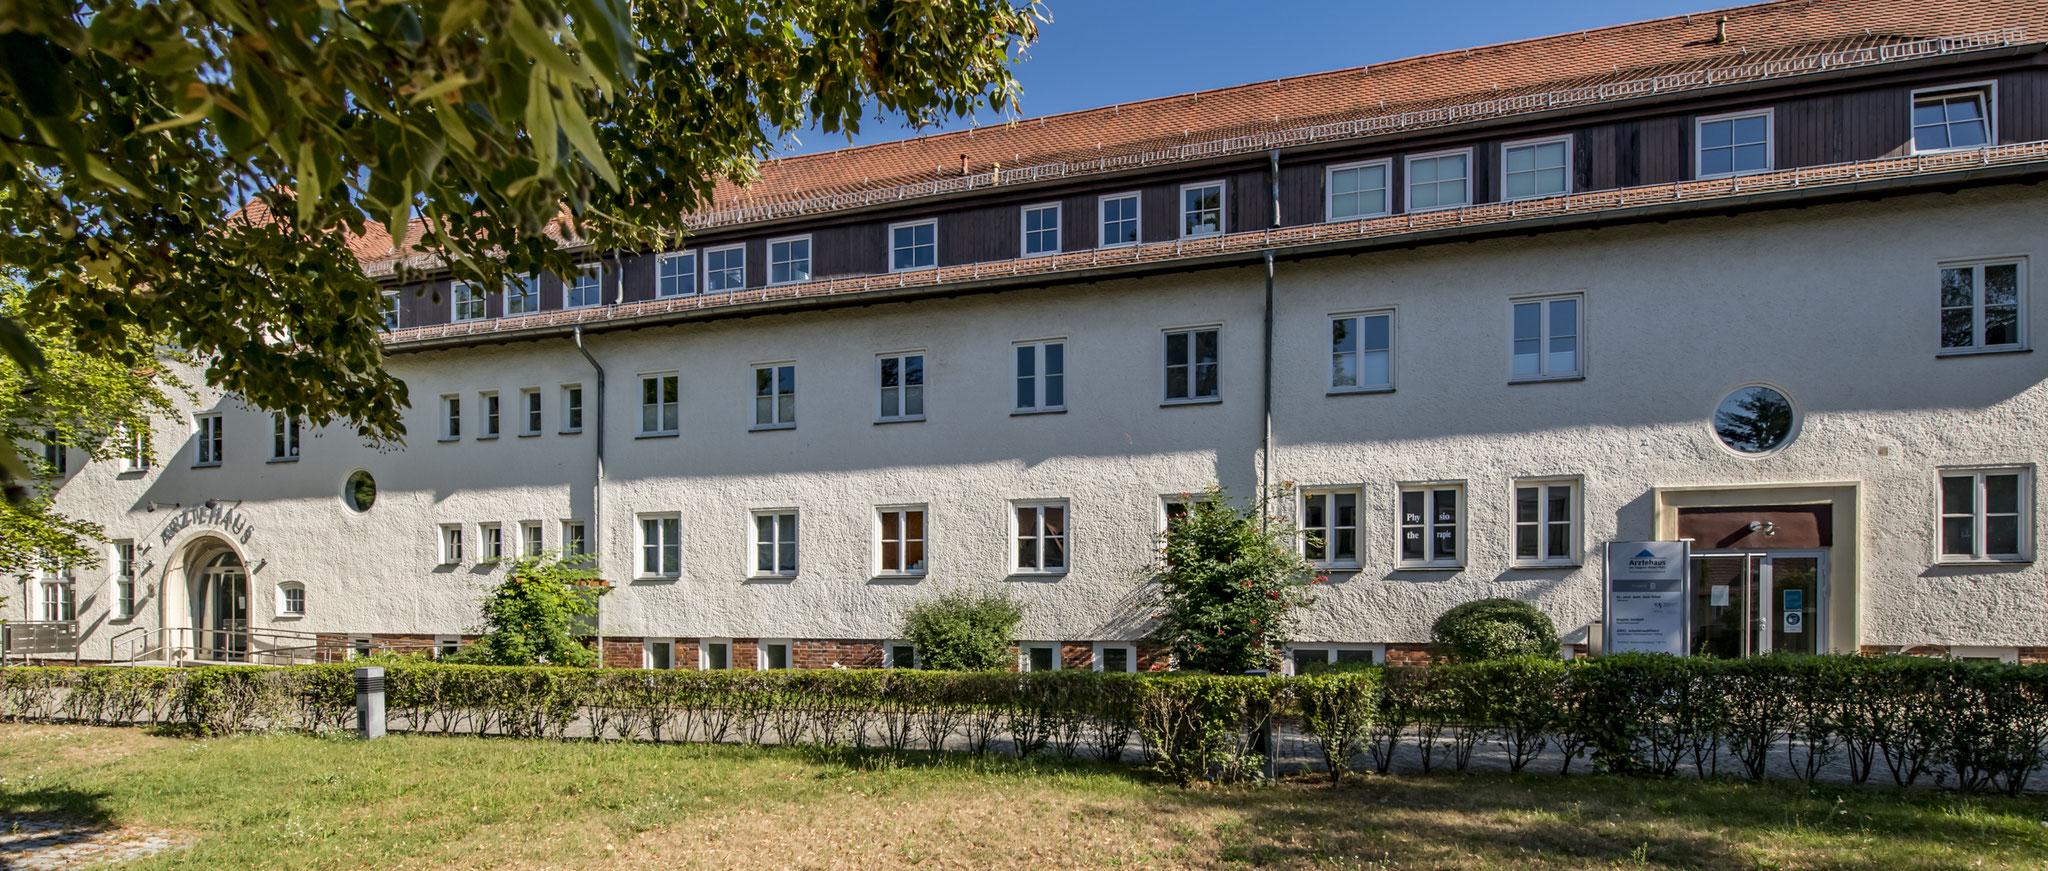 Ärztehaus am August-Bebel-Platz 2